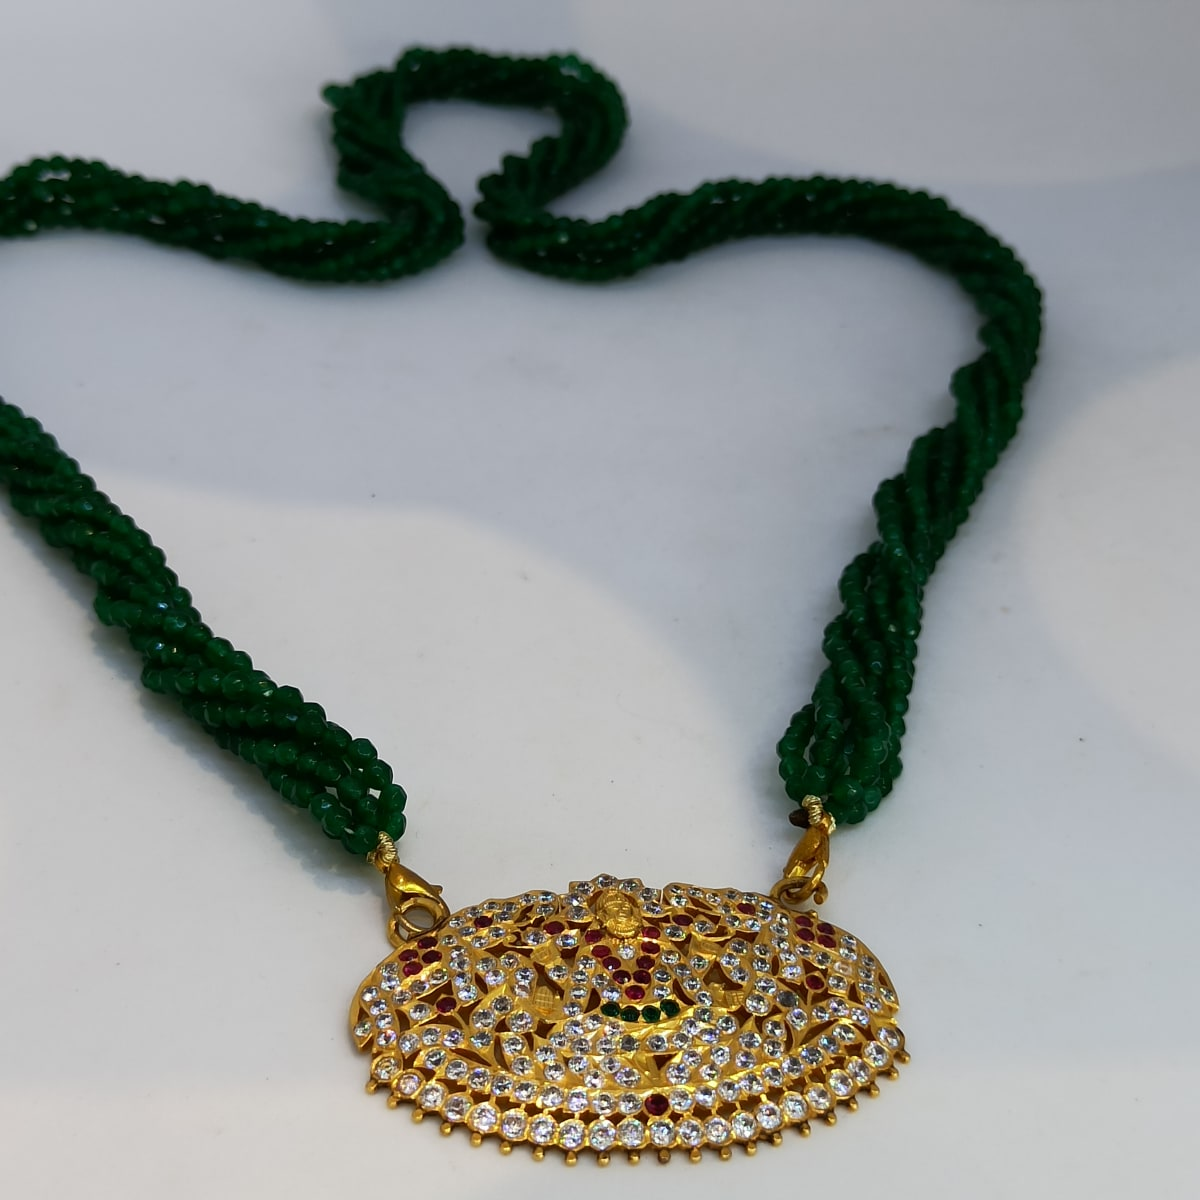 Green Mala Lakshmi Necklace